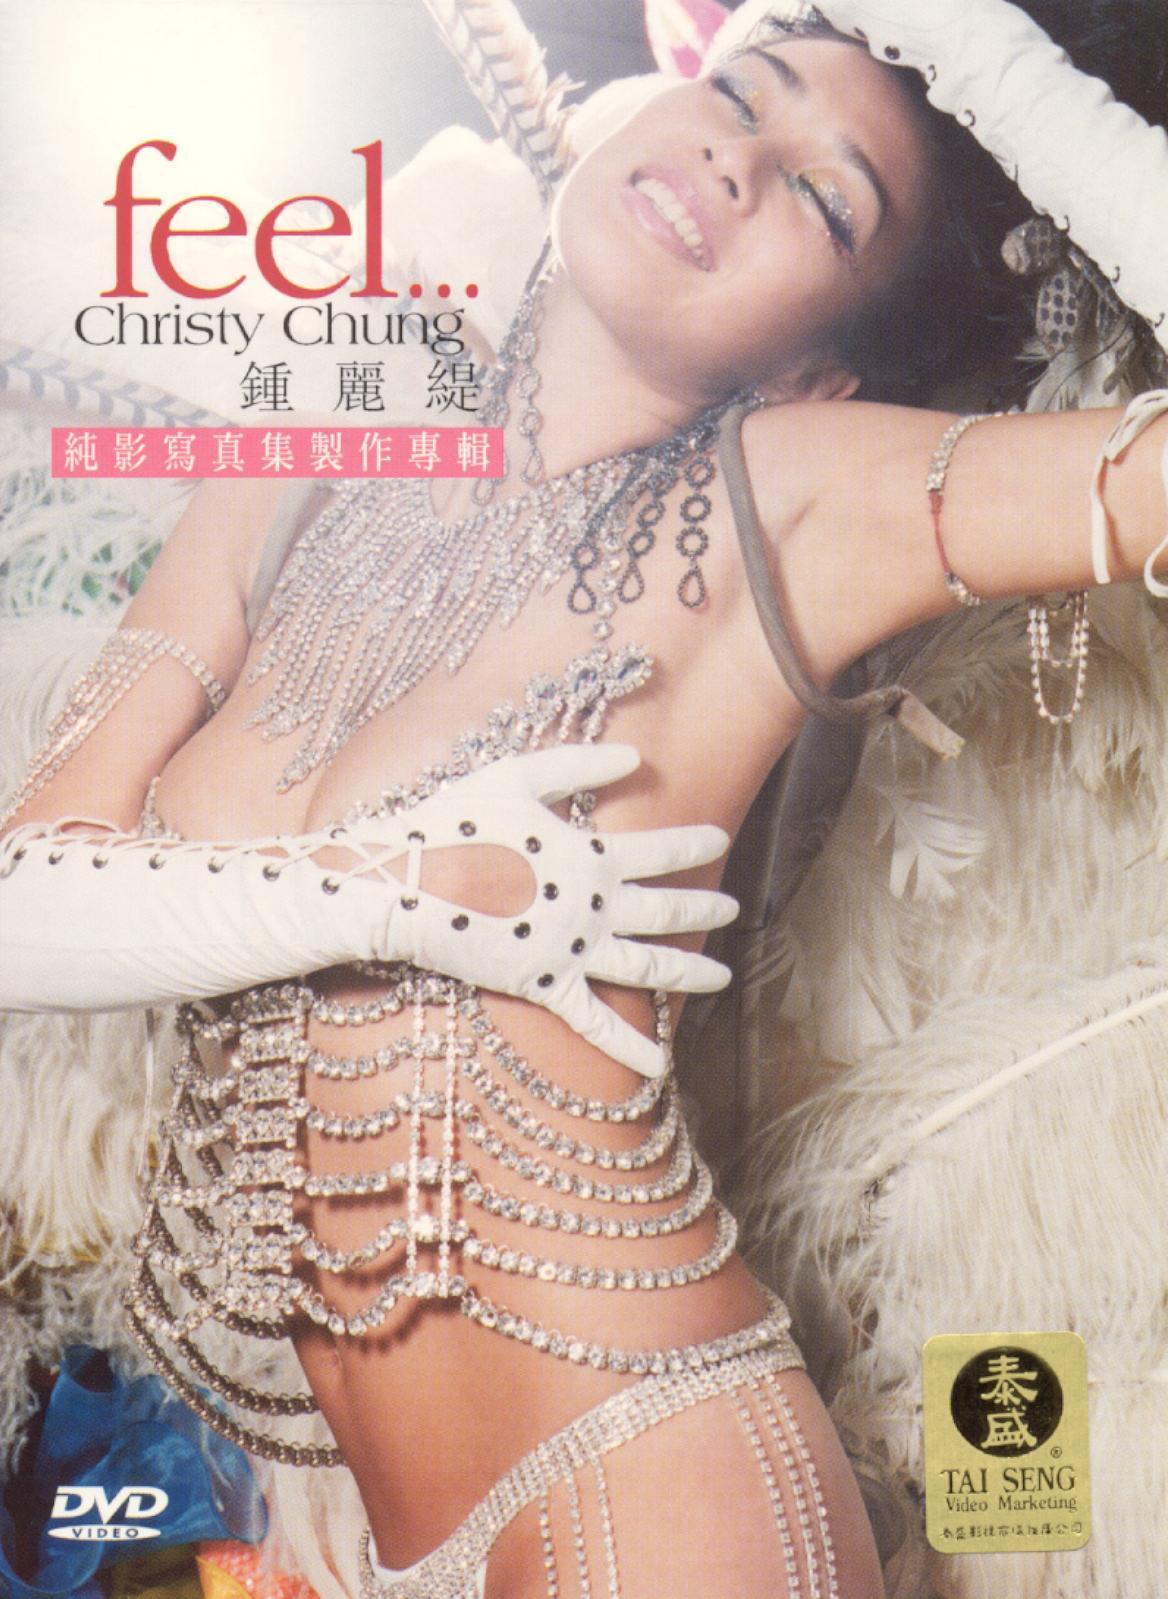 Feel... Christy Chung